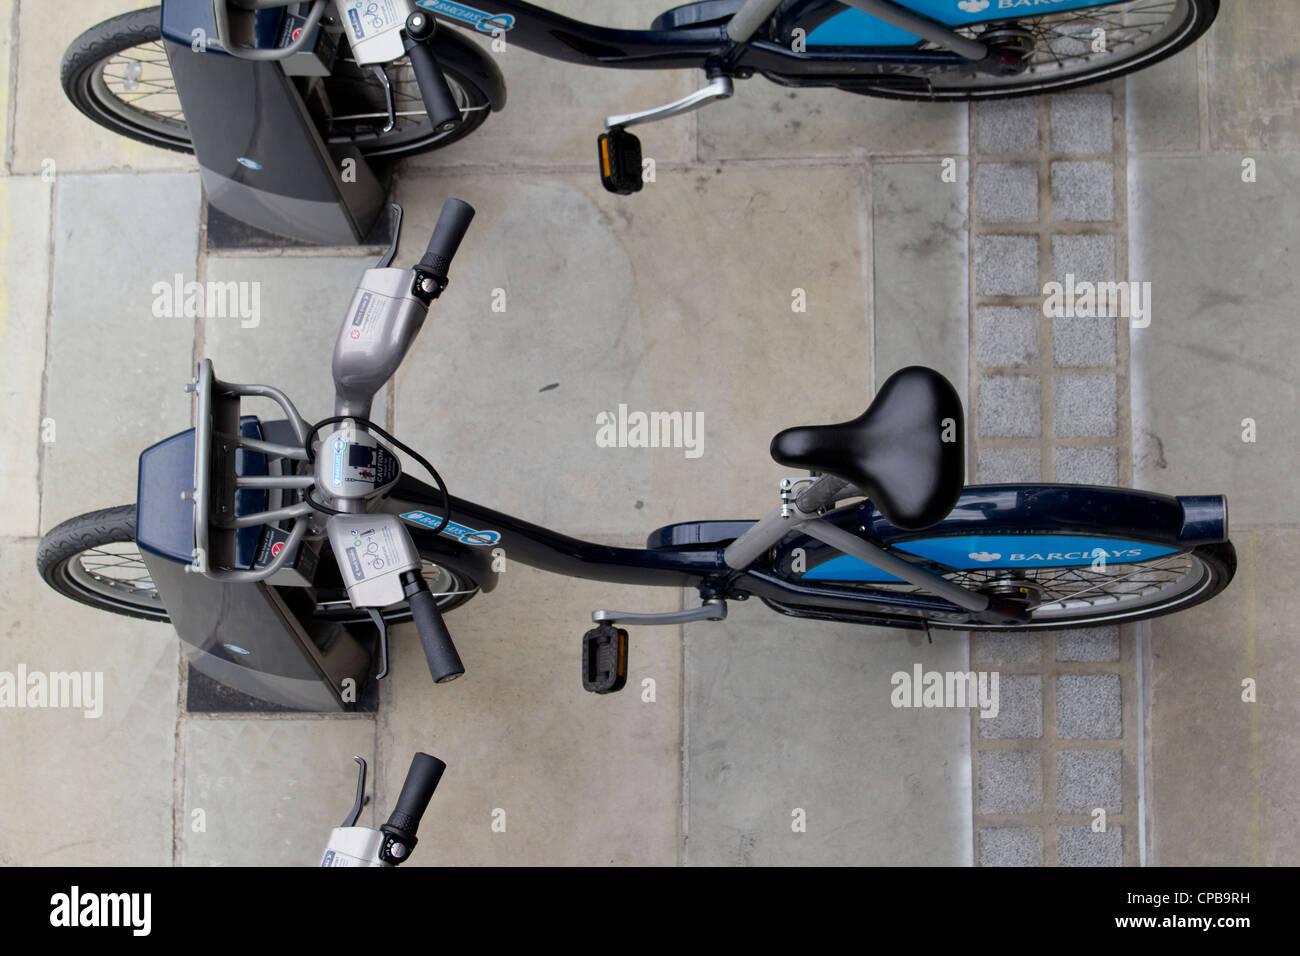 Boris bikes, Londres ciclo scheme, alquiler bicicletas Barclays azul Imagen De Stock